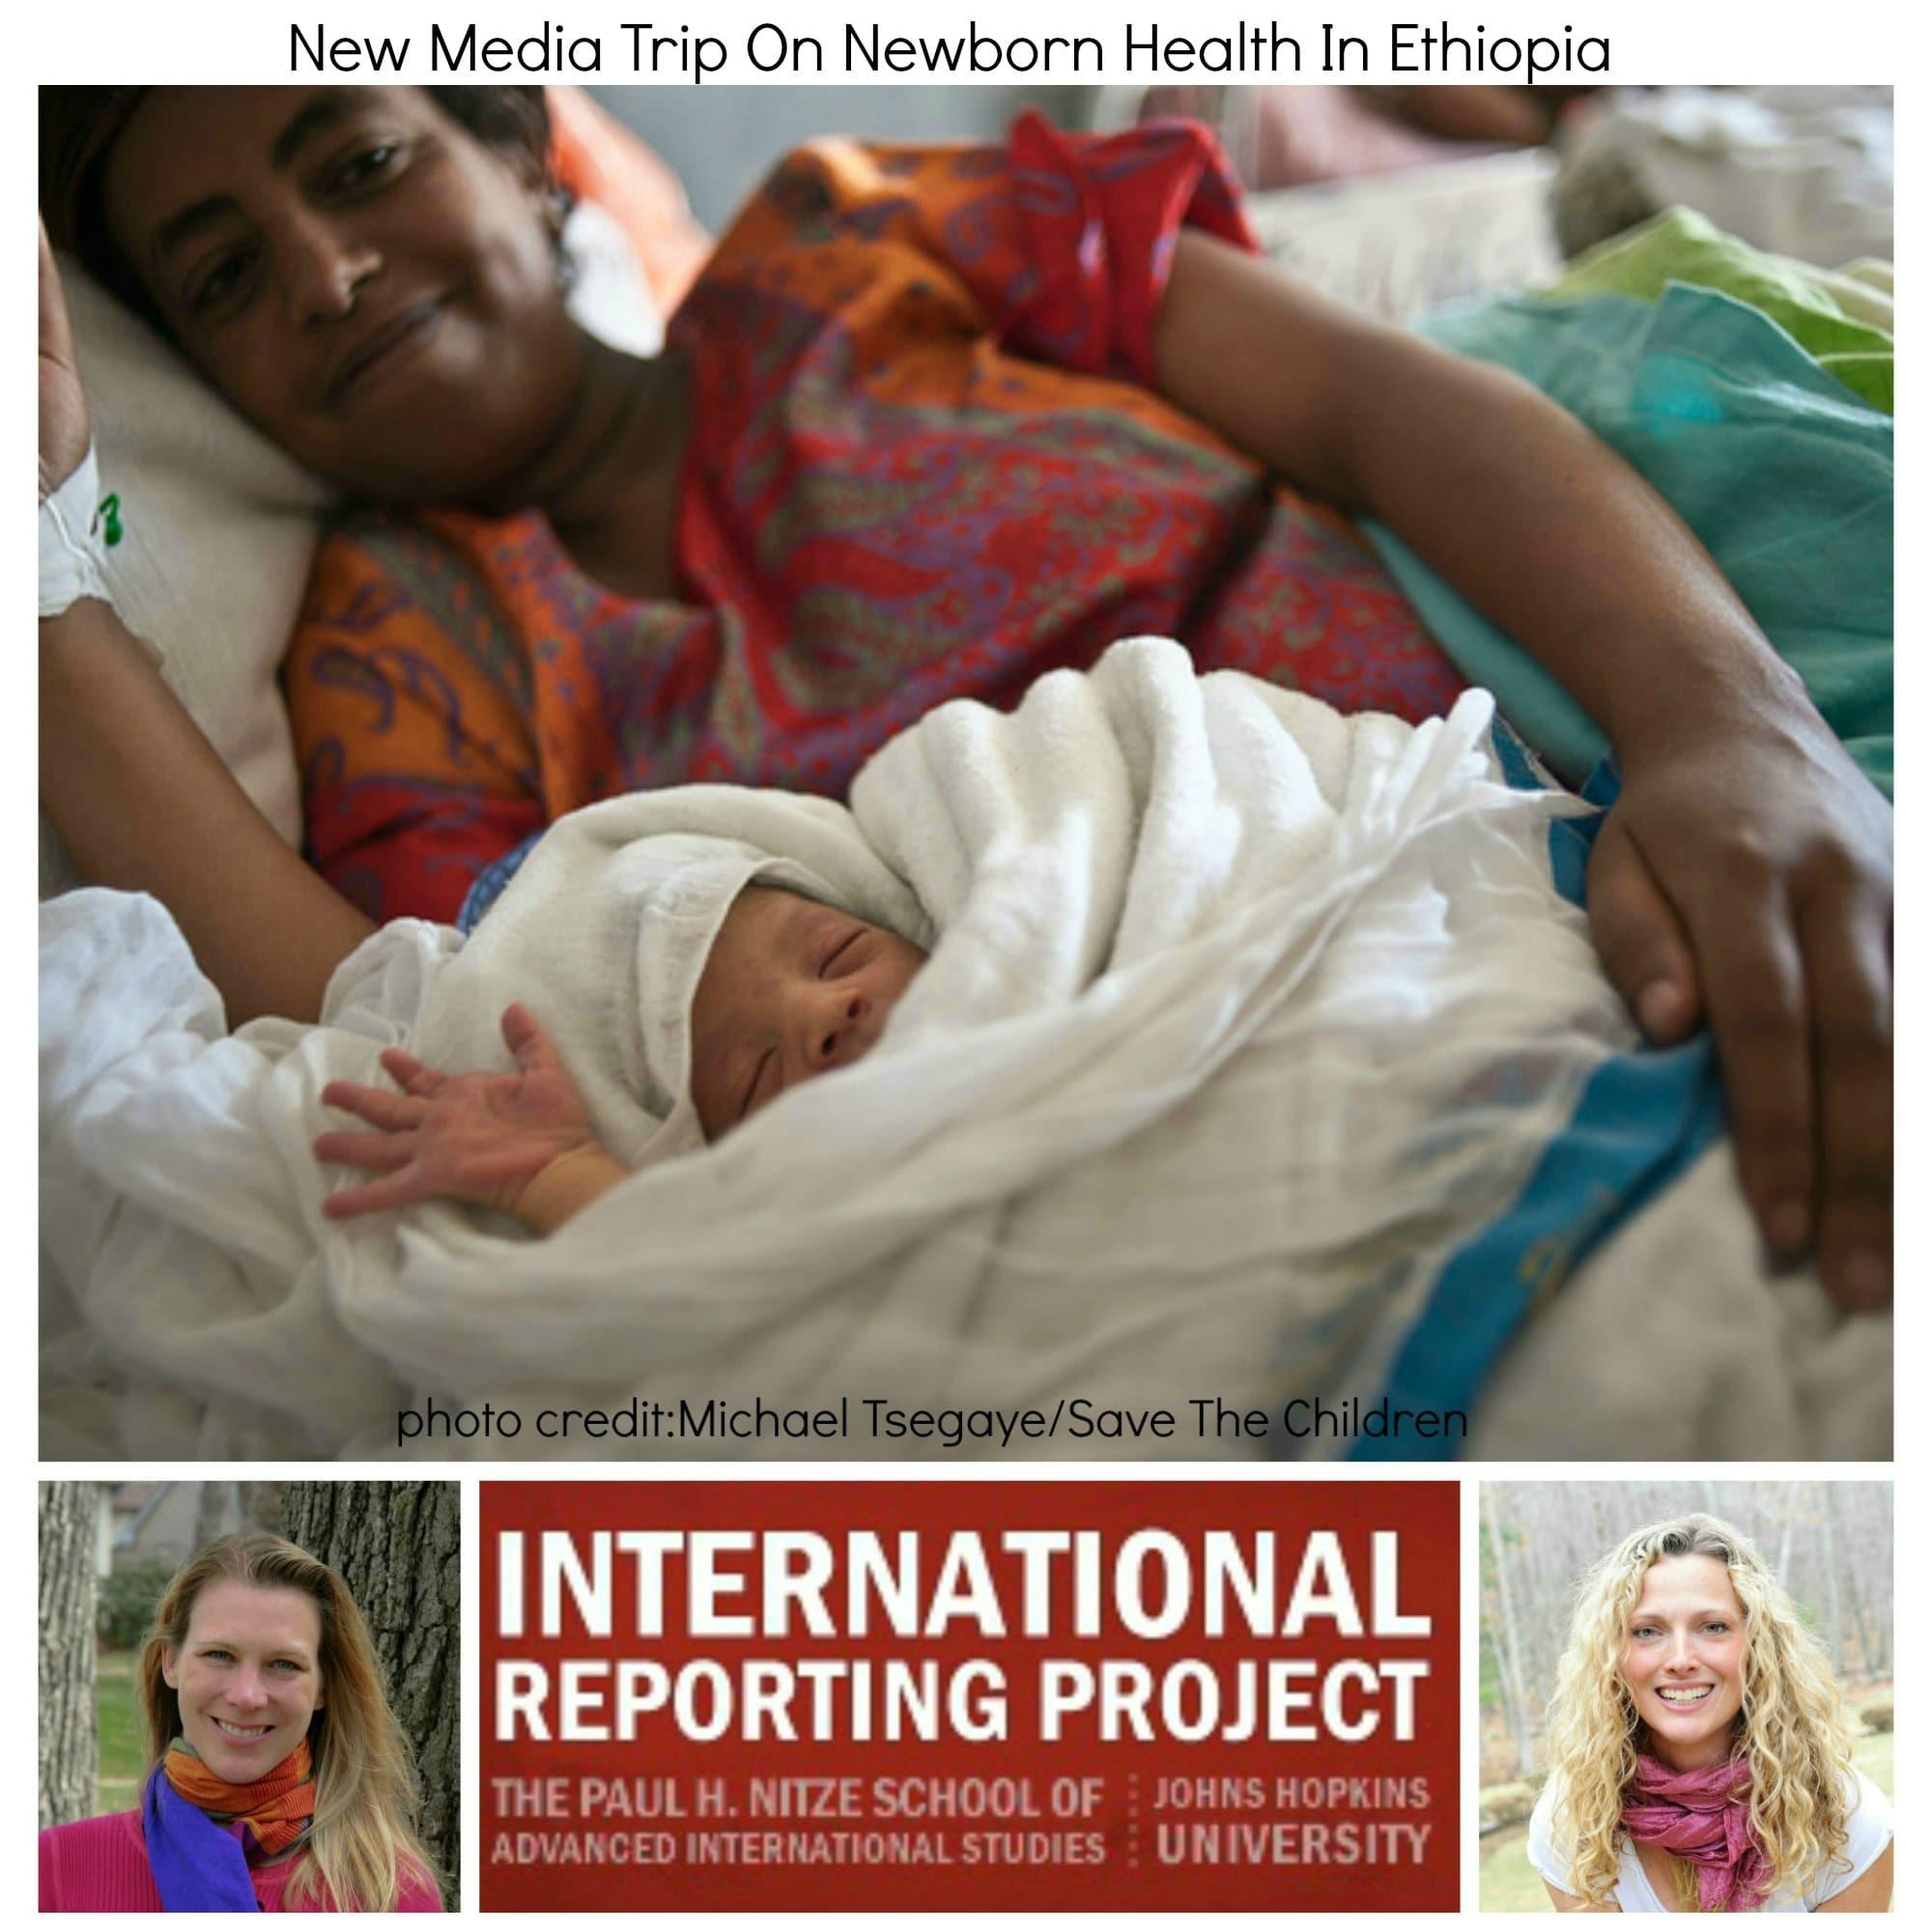 SOCIAL GOOD: World Moms Blog Editors Heading to Ethiopia to Report on Newborn Health #EthiopiaNewborns